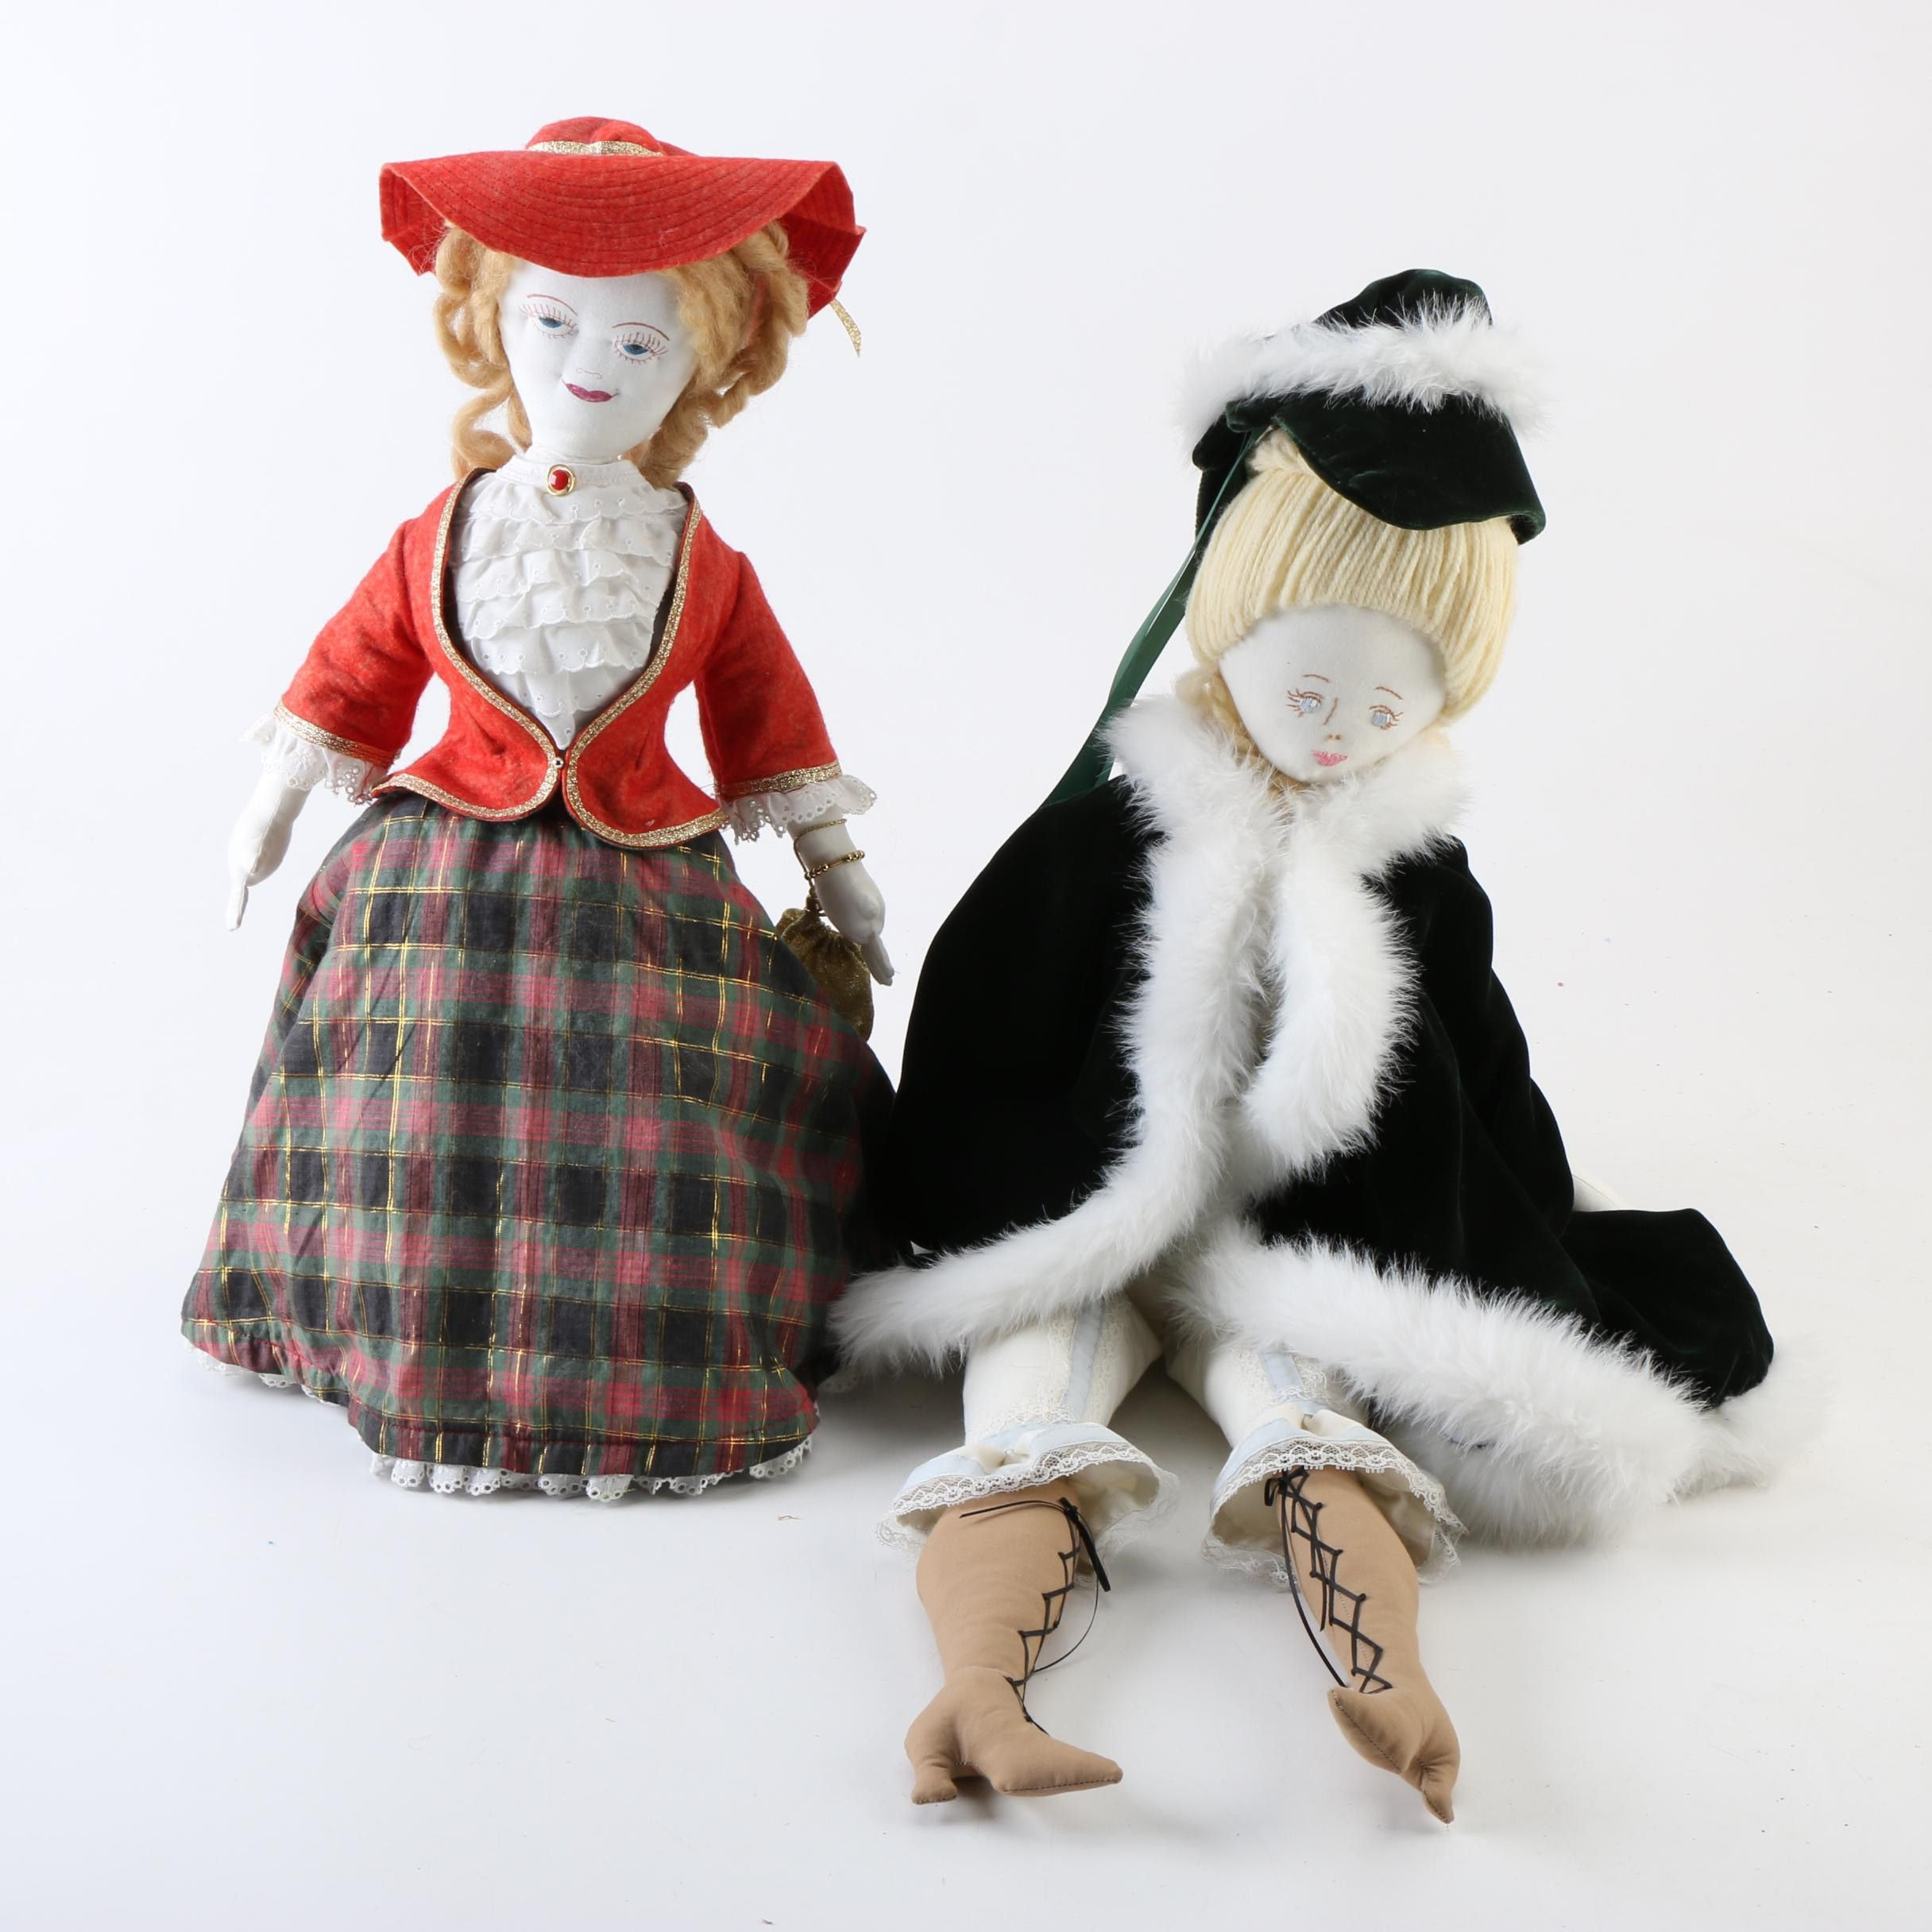 Vintage Hand Crafted Plush Fashion Dolls